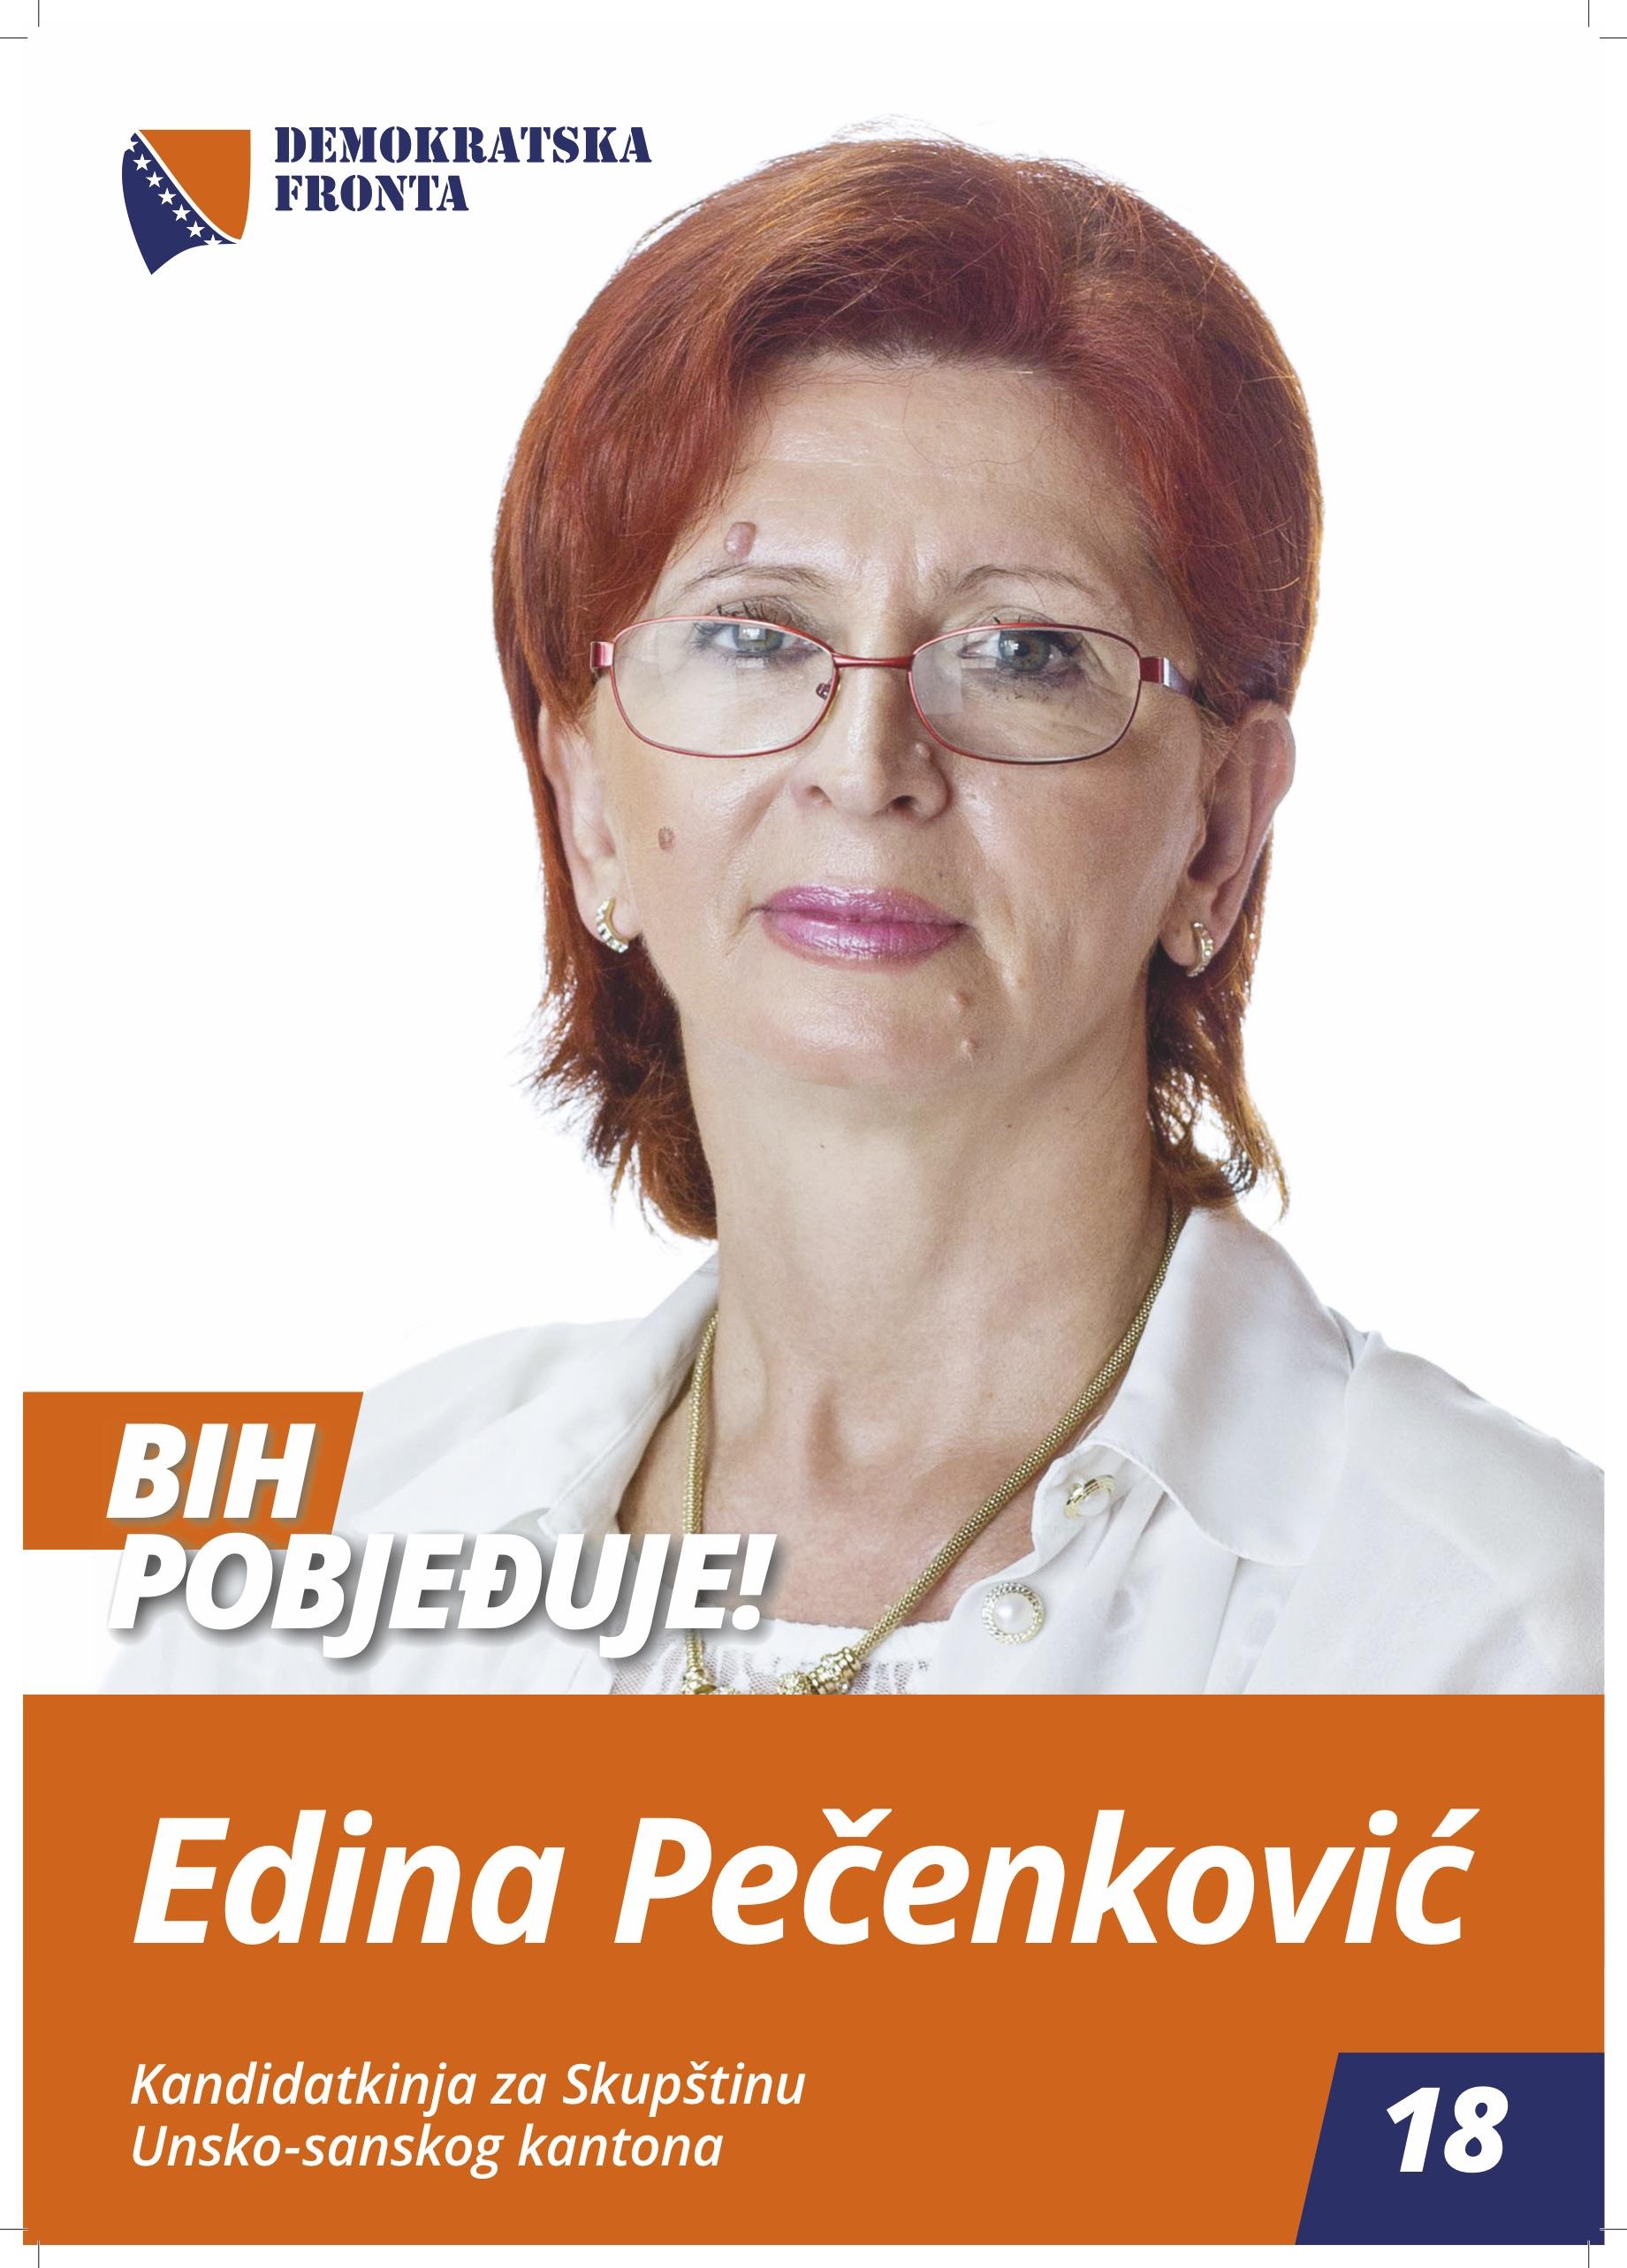 Edina Pečenković, medicinska sestra